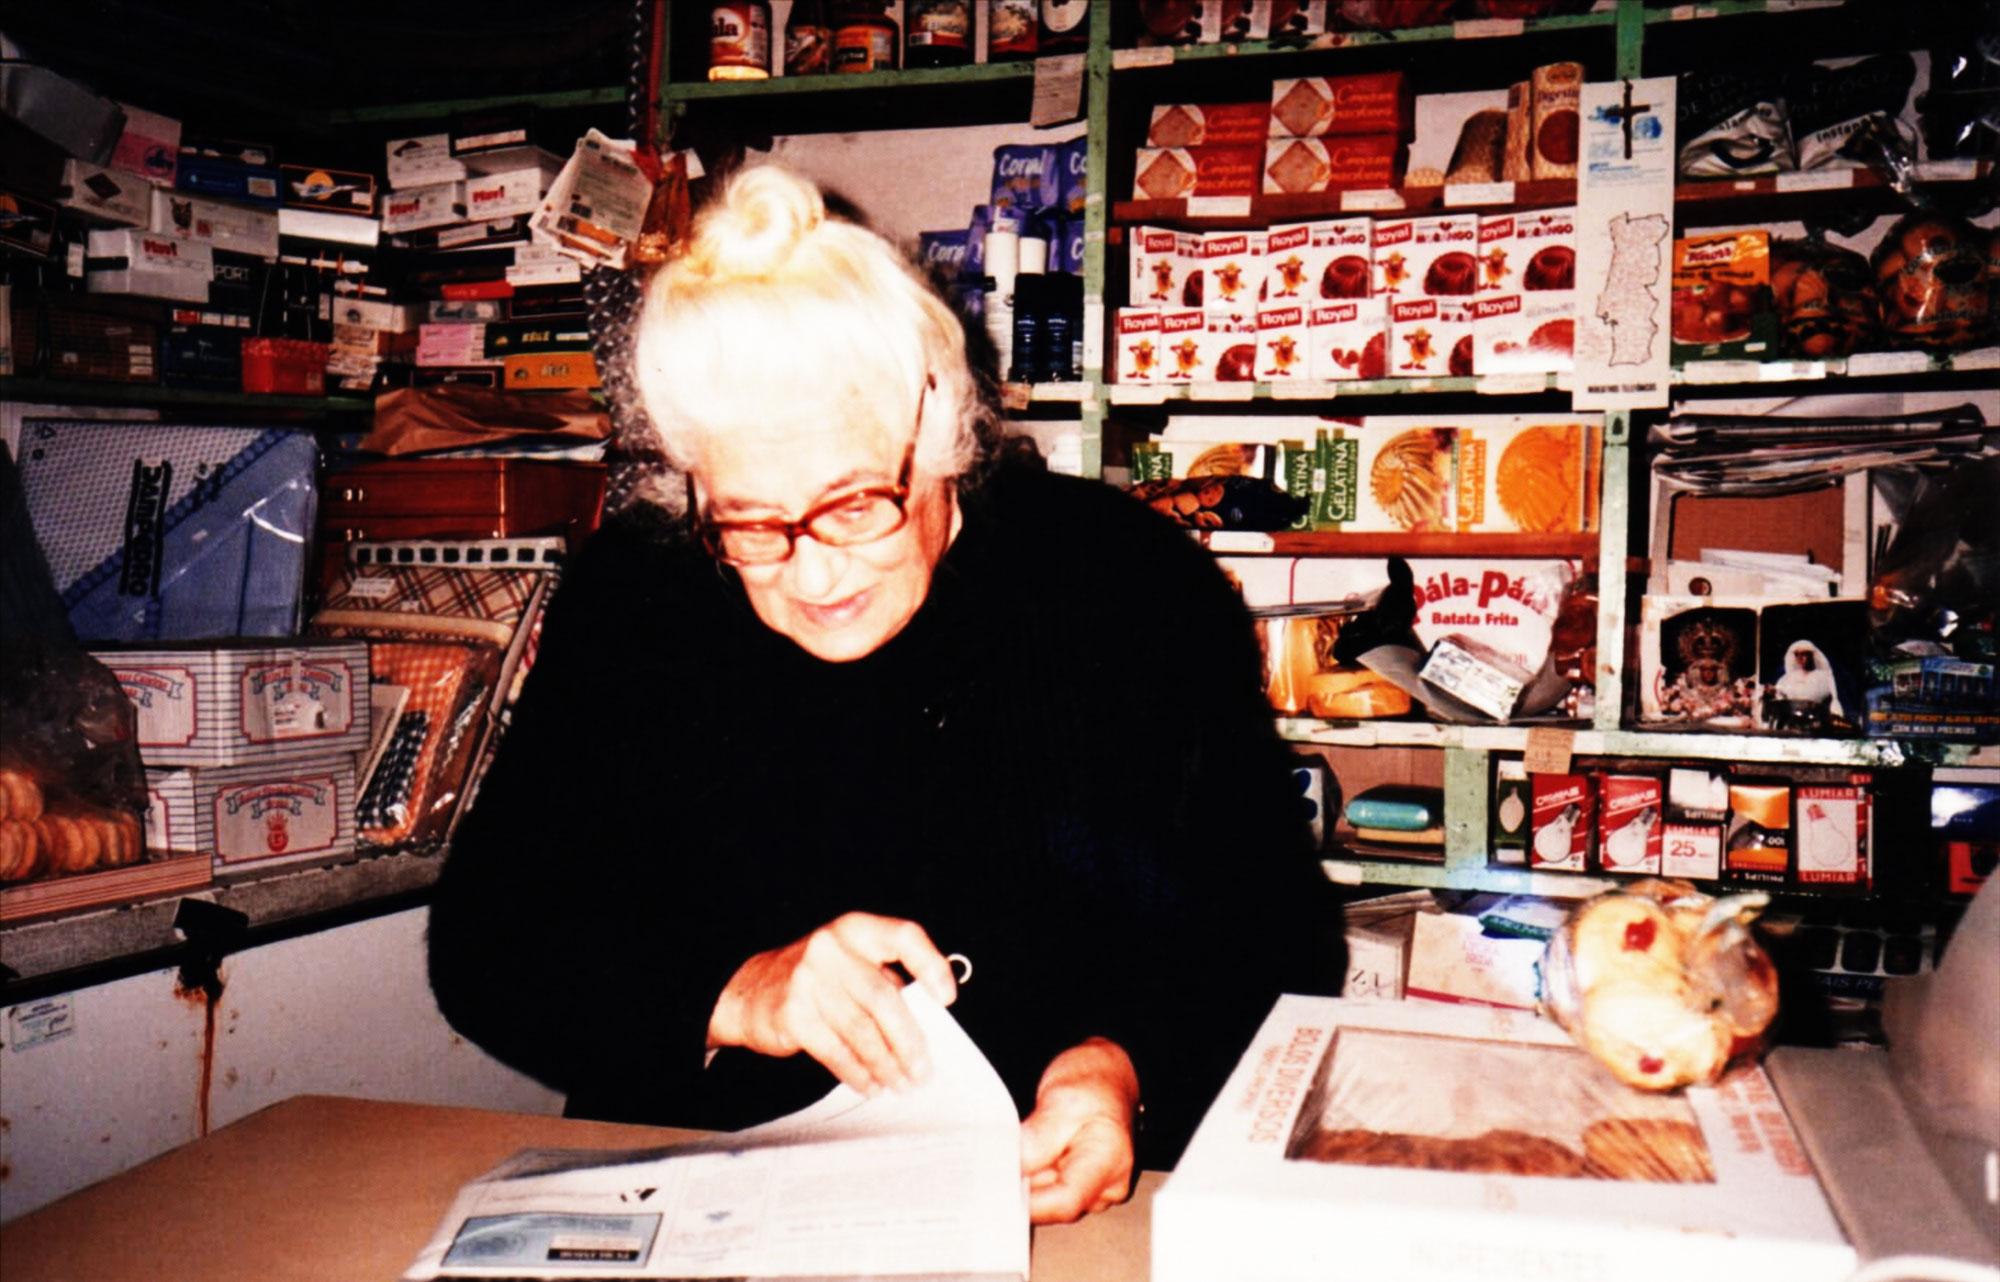 Maria Saraiva - «Maria Graniza» (M. F. Novo, 1998)